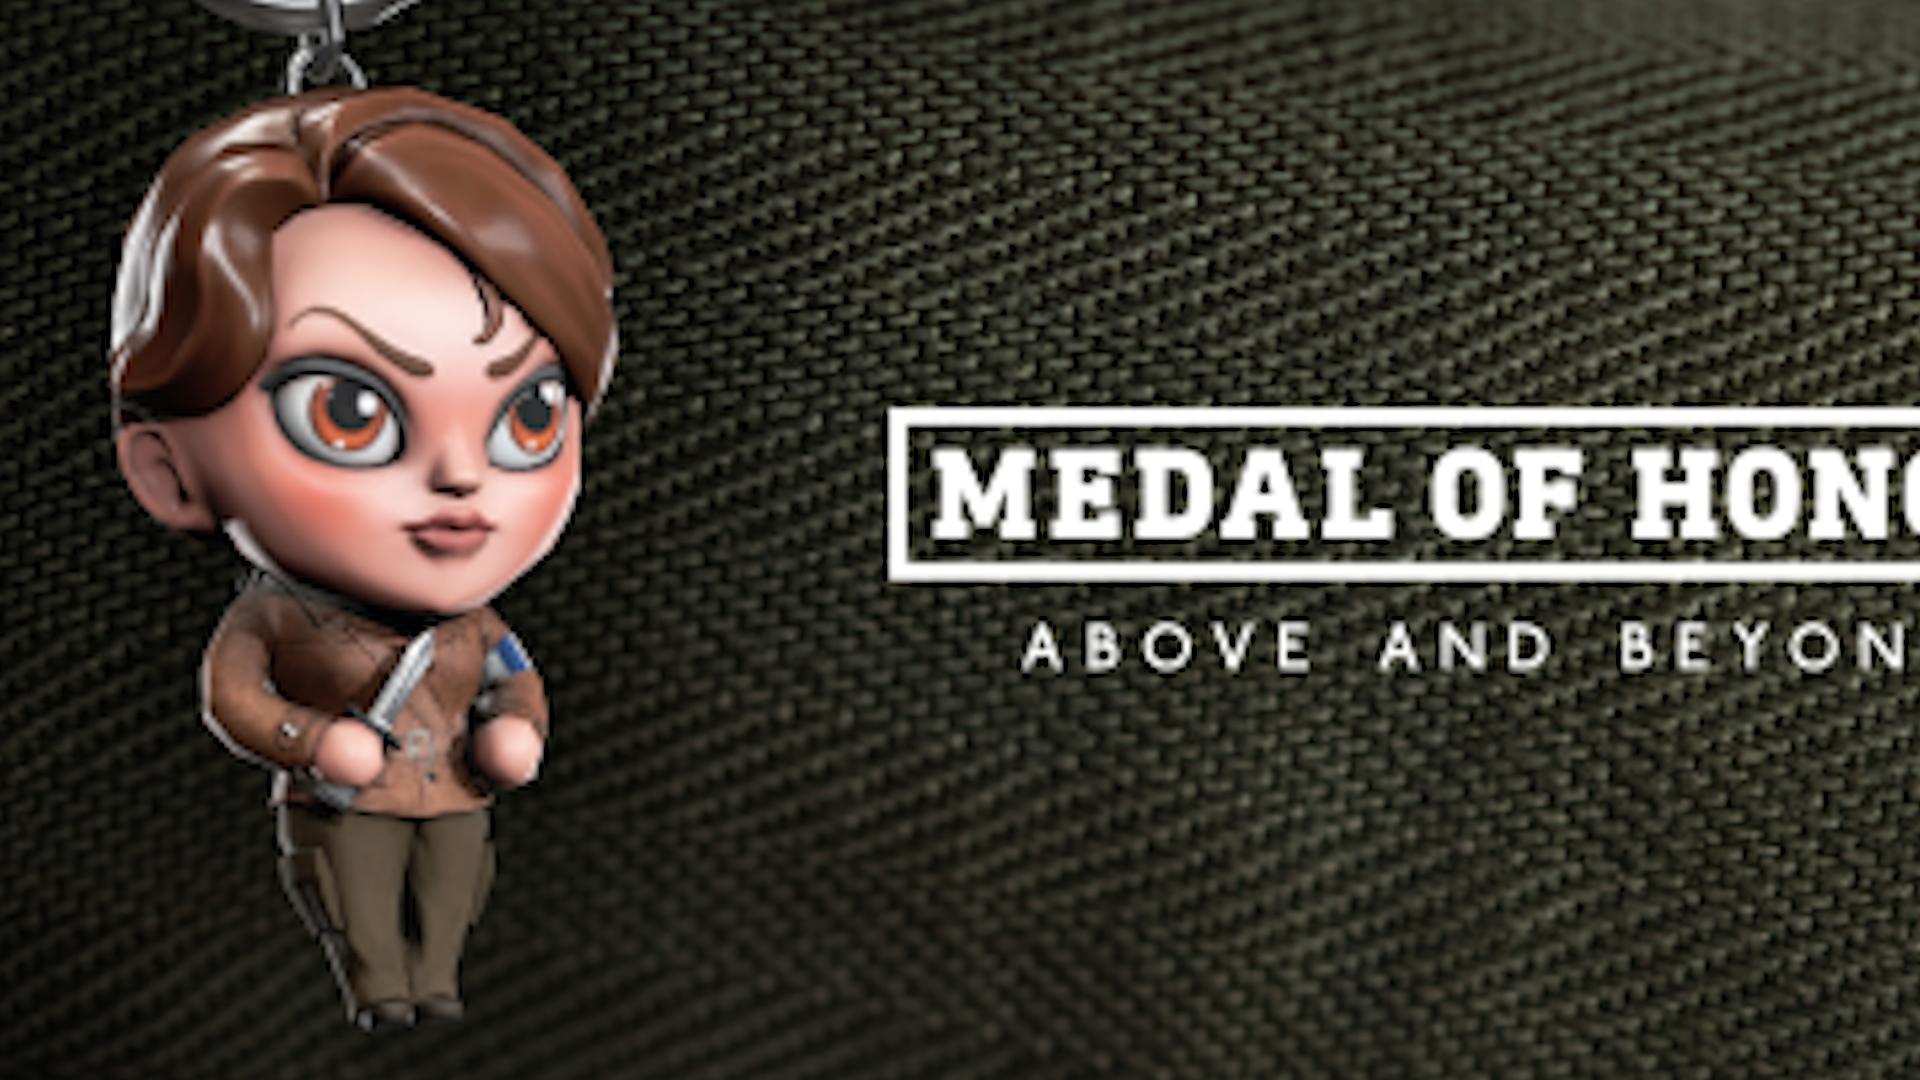 【APEX】シーズン7で「メダル・オブ・オナー」とのコラボ武器チャームが登場か、限定武器チャームの見た目がリーク!